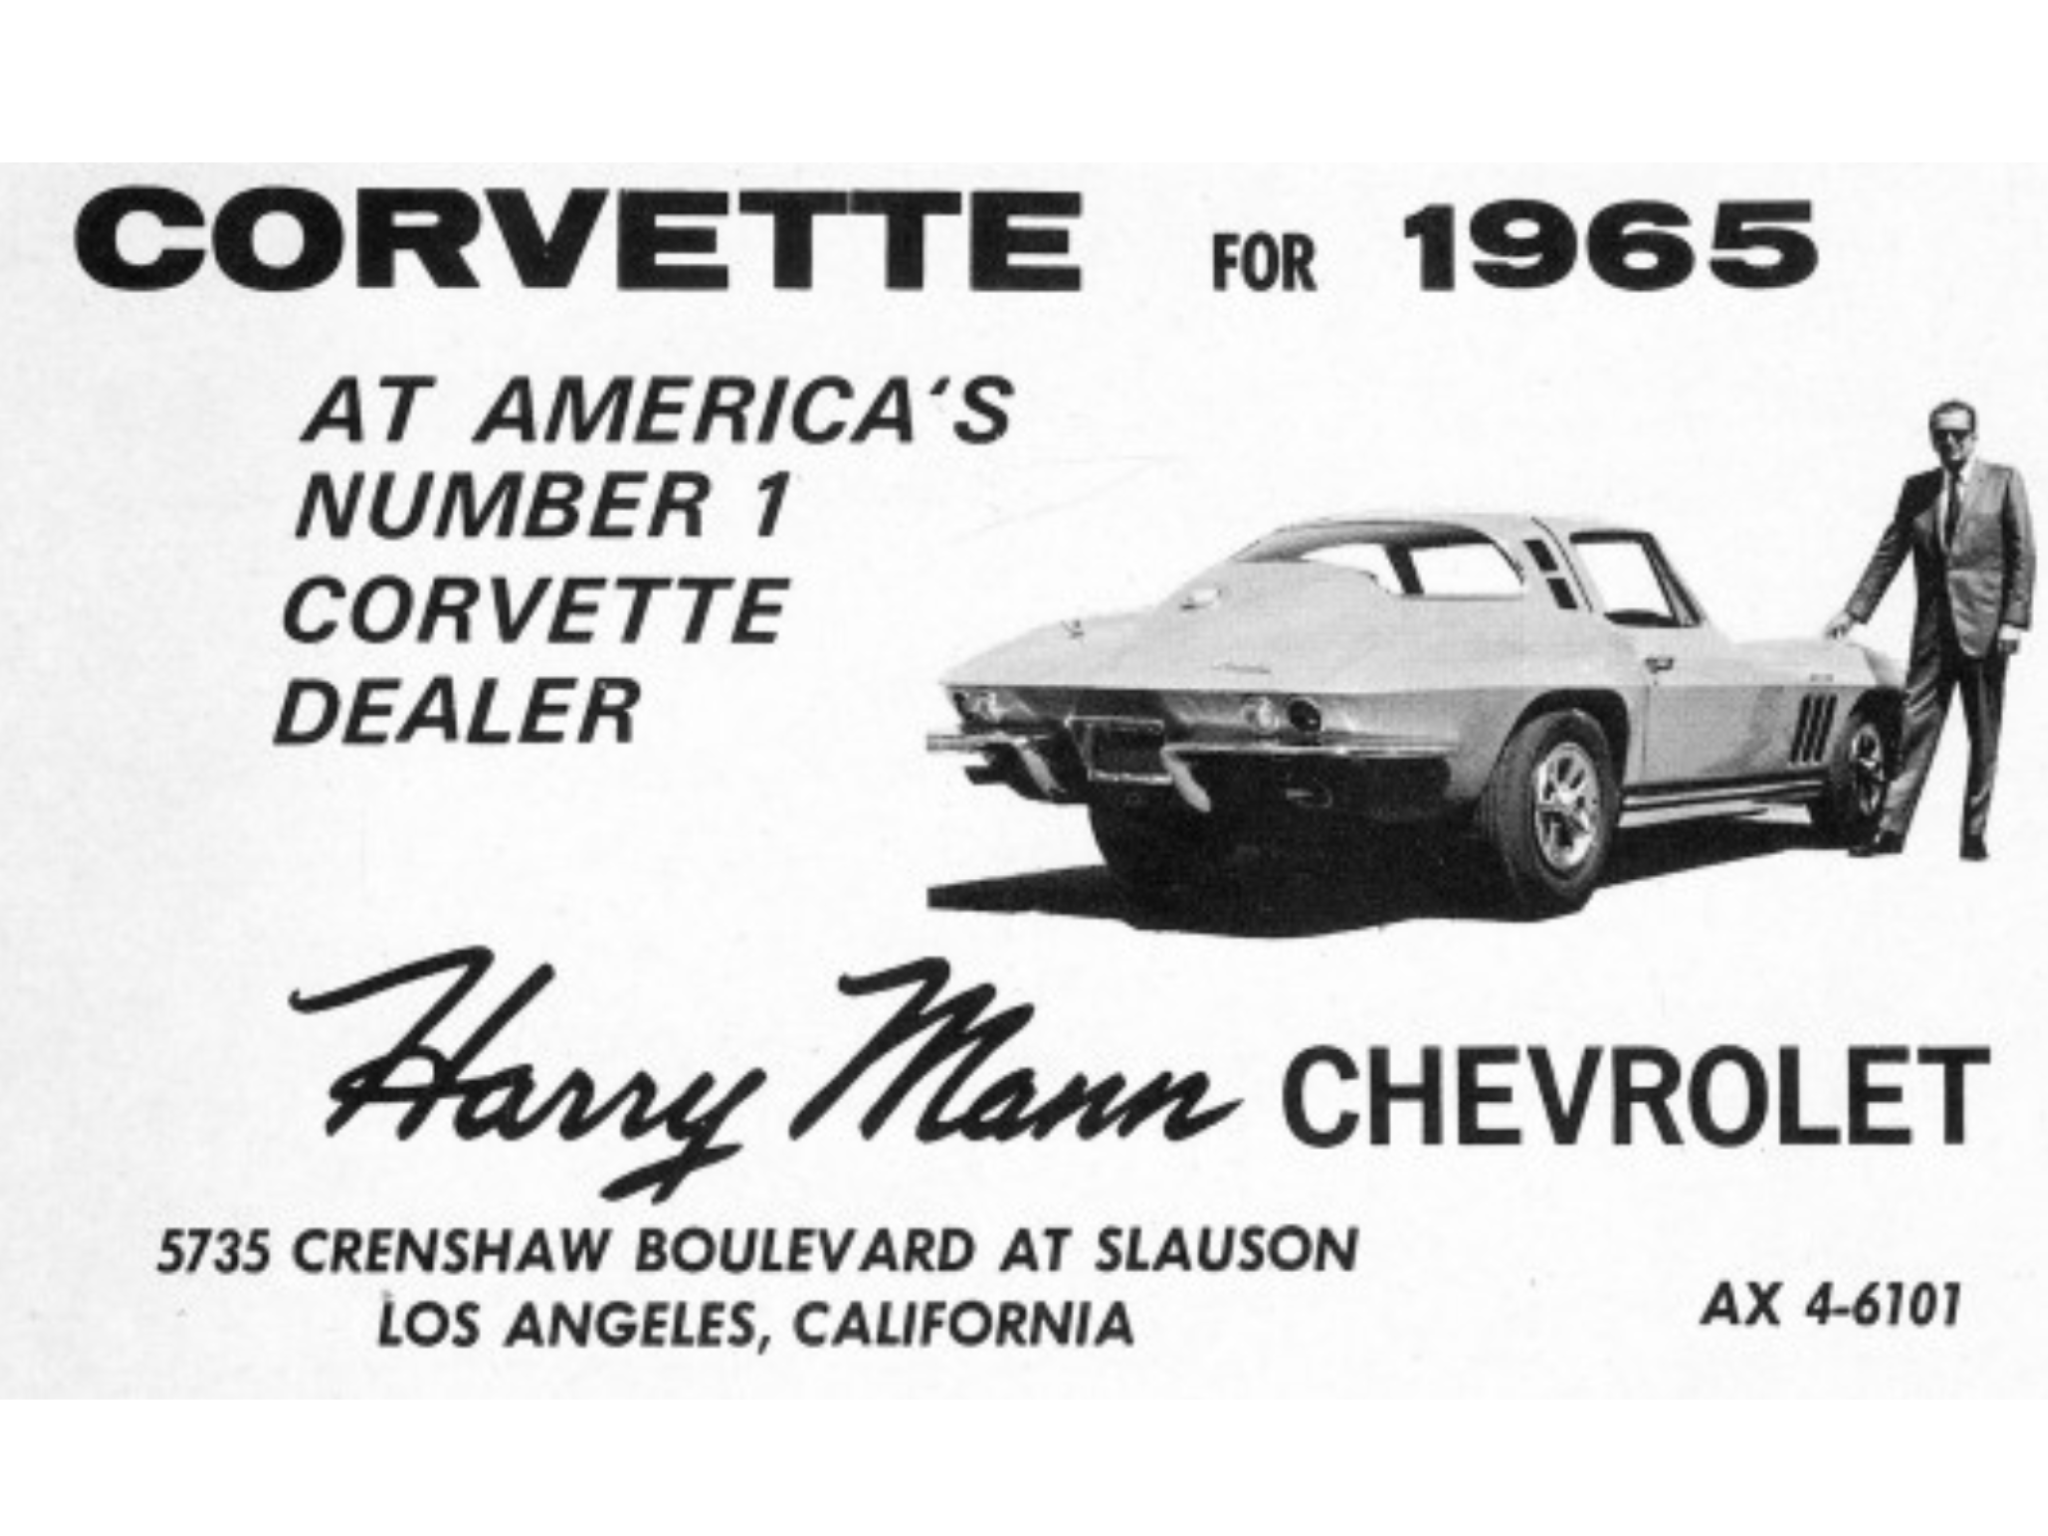 1965 Harry Mann Chevrolet Dealership Los Angeles California Chevrolet Dealership Vintage Corvette Chevrolet